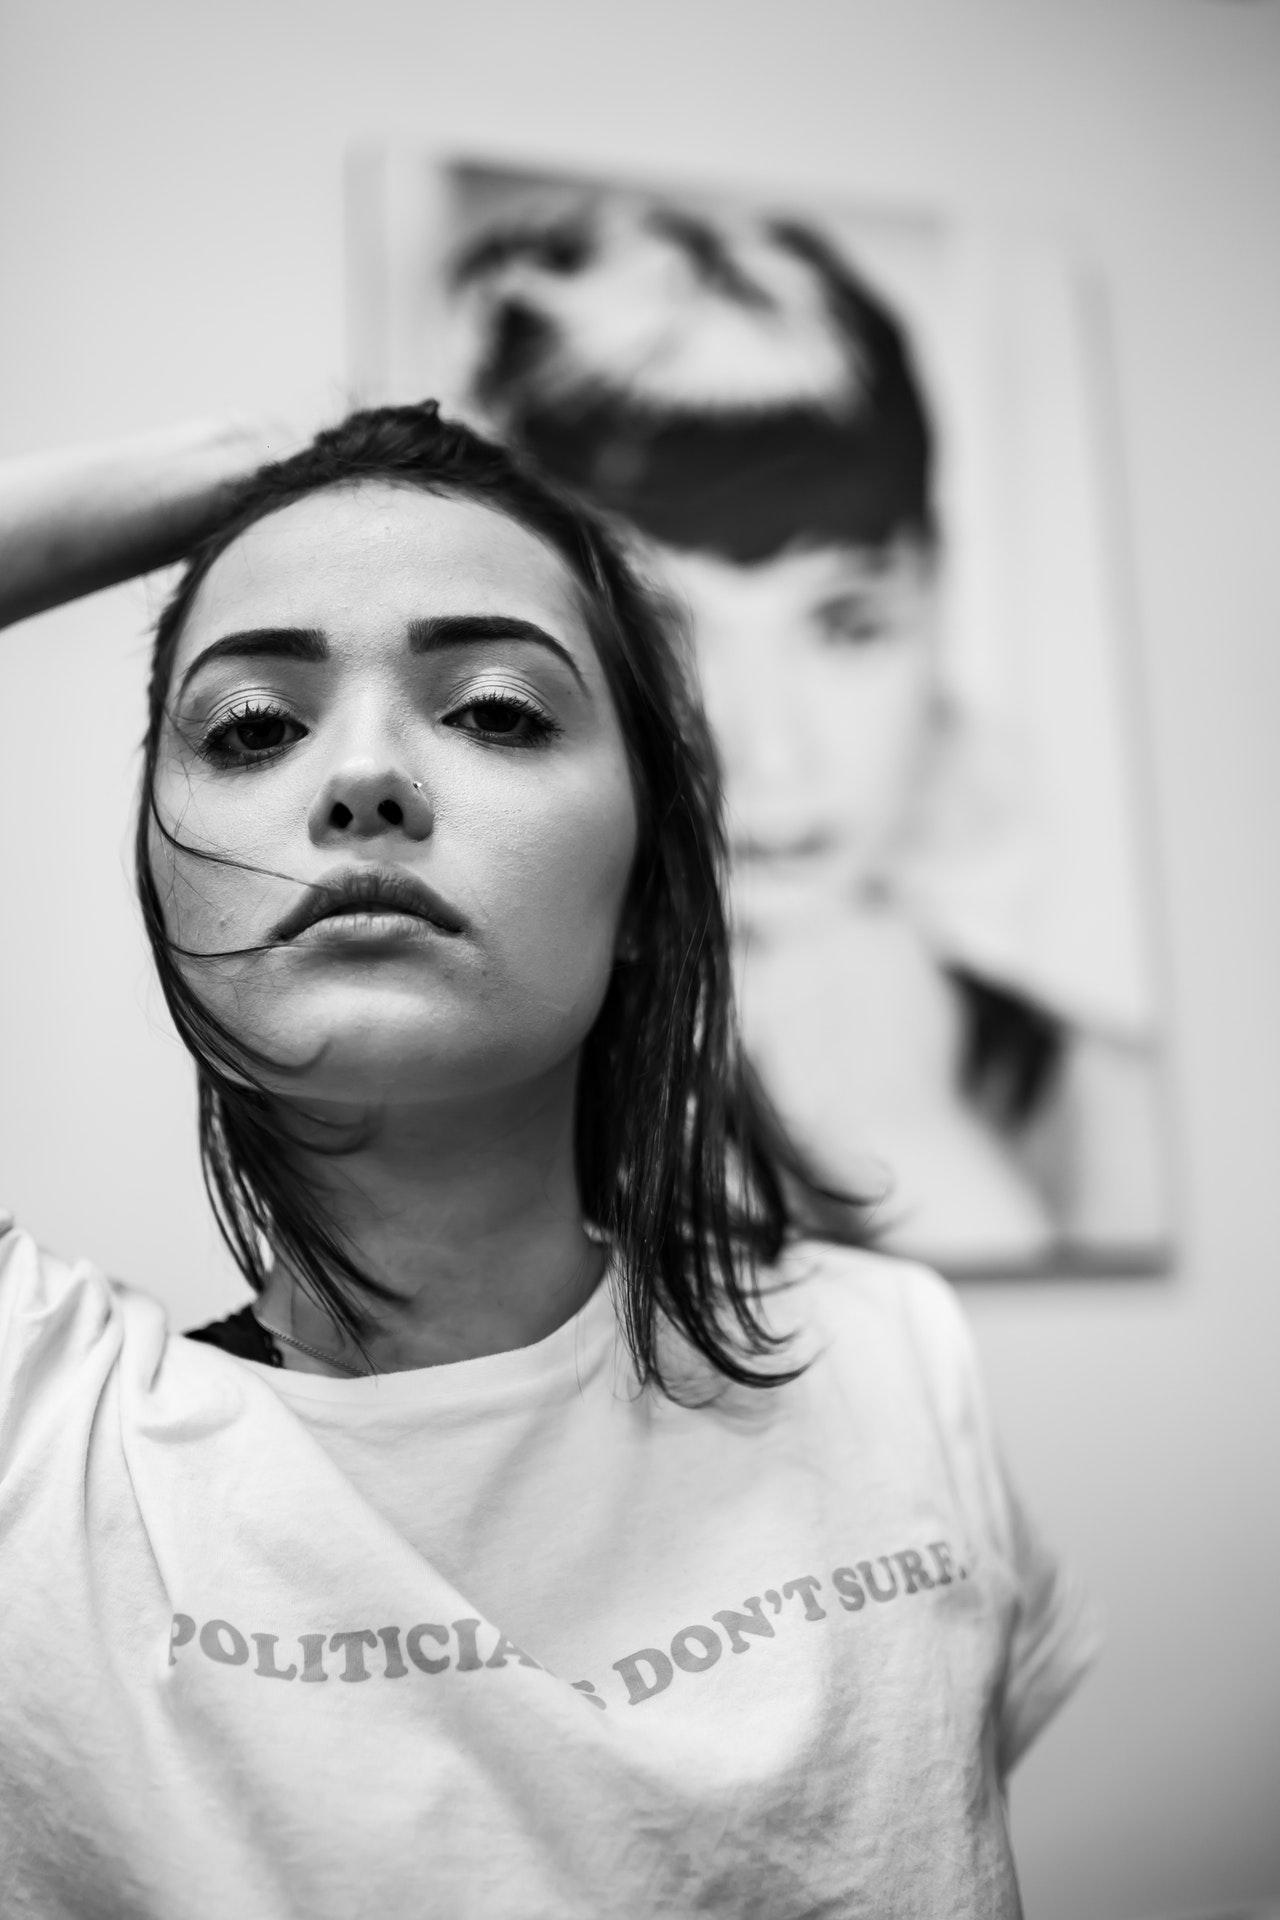 Jorge Fakhouri Filho/Pexels